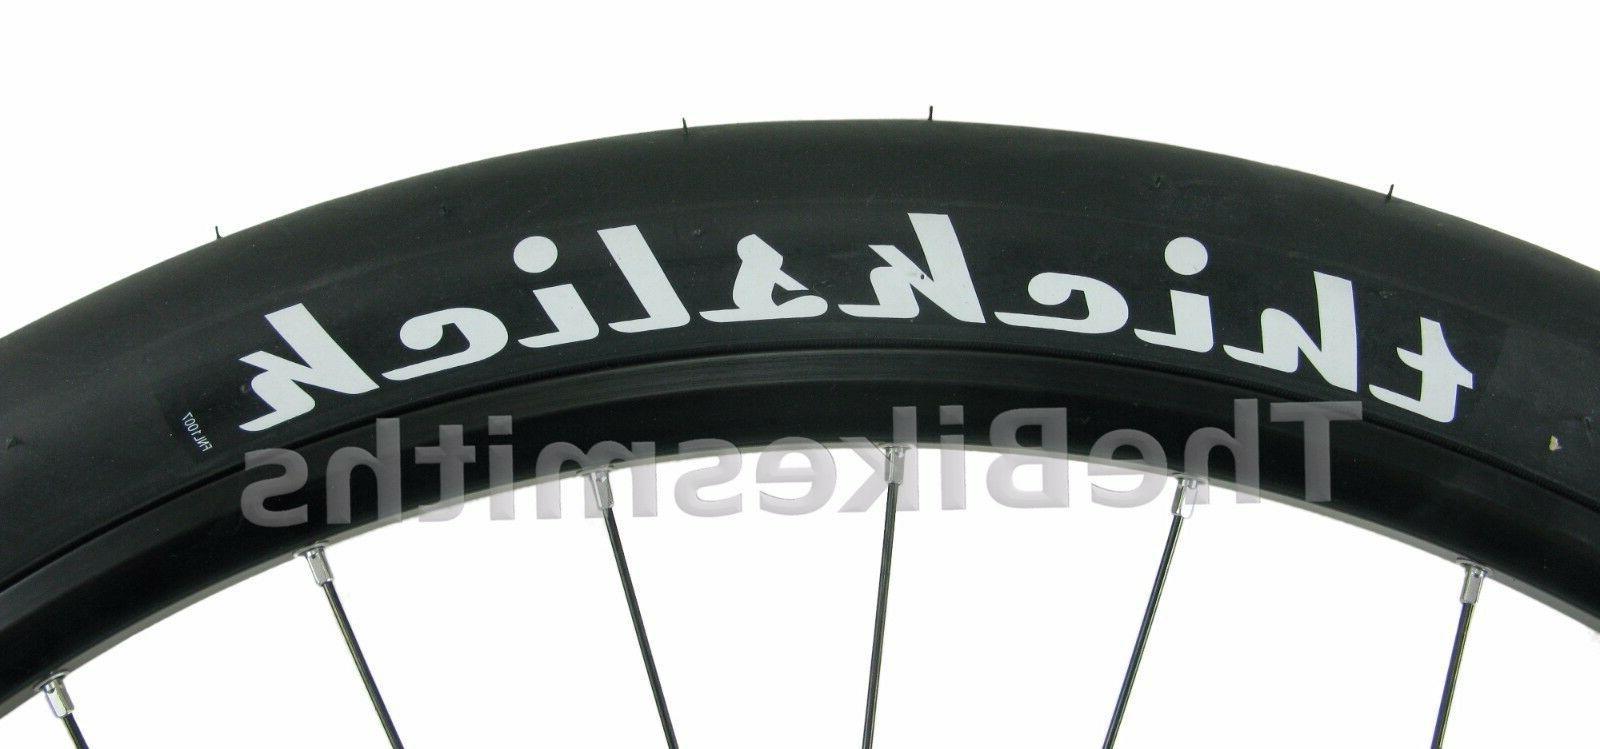 "WTB ThickSlick COMP 29 x 2.1"" Mountain Bike Tire Street Comm"